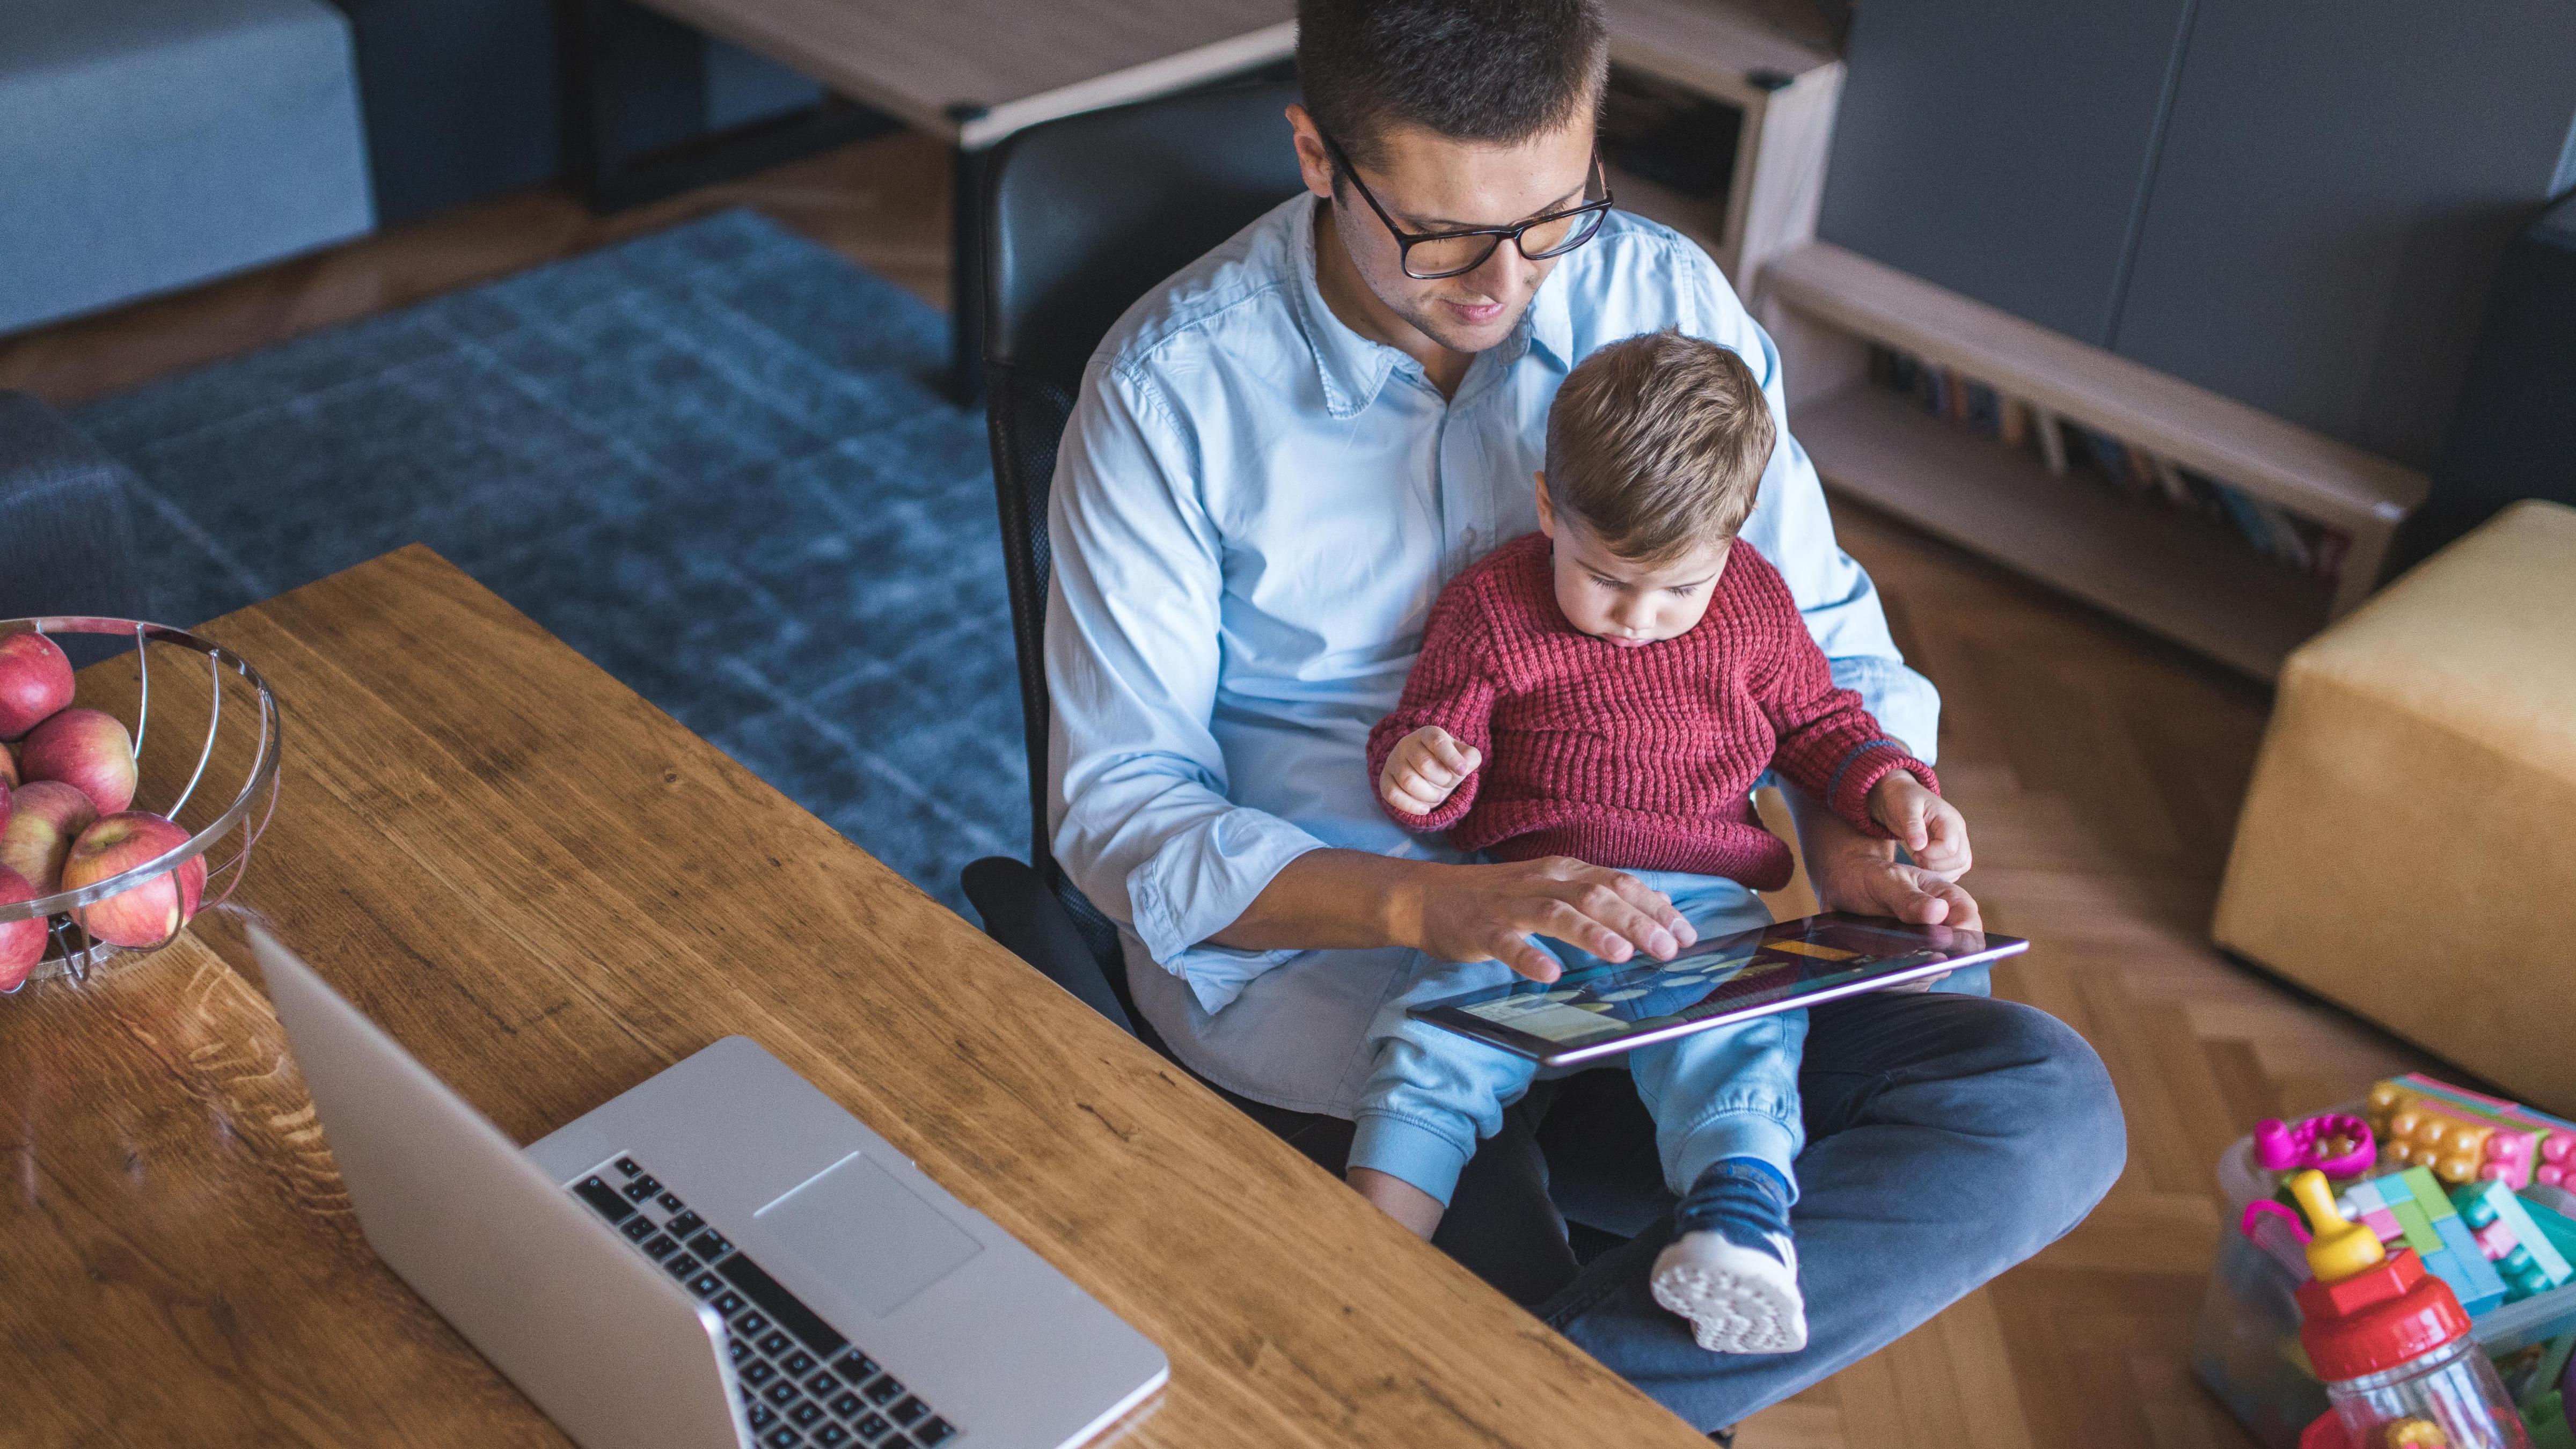 Virtual Vocations - Remote Work Schedule Templates - Single Parents